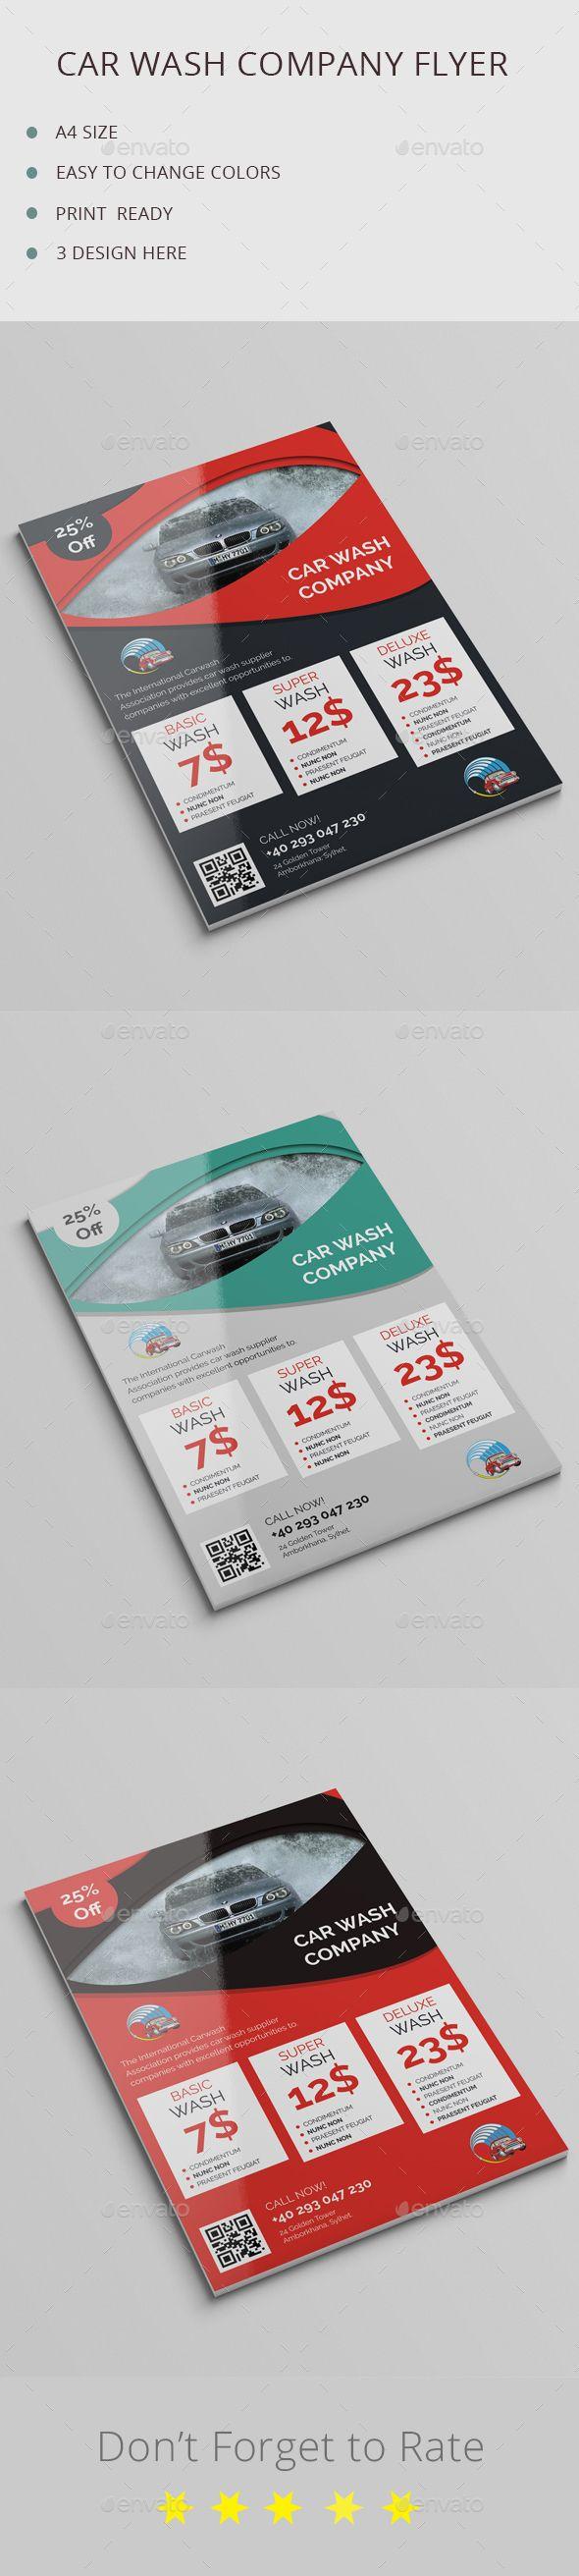 Car Wash Company Flyer Template PSD #design Download: http://graphicriver.net/item/car-wash-company-flyer-/13353701?ref=ksioks